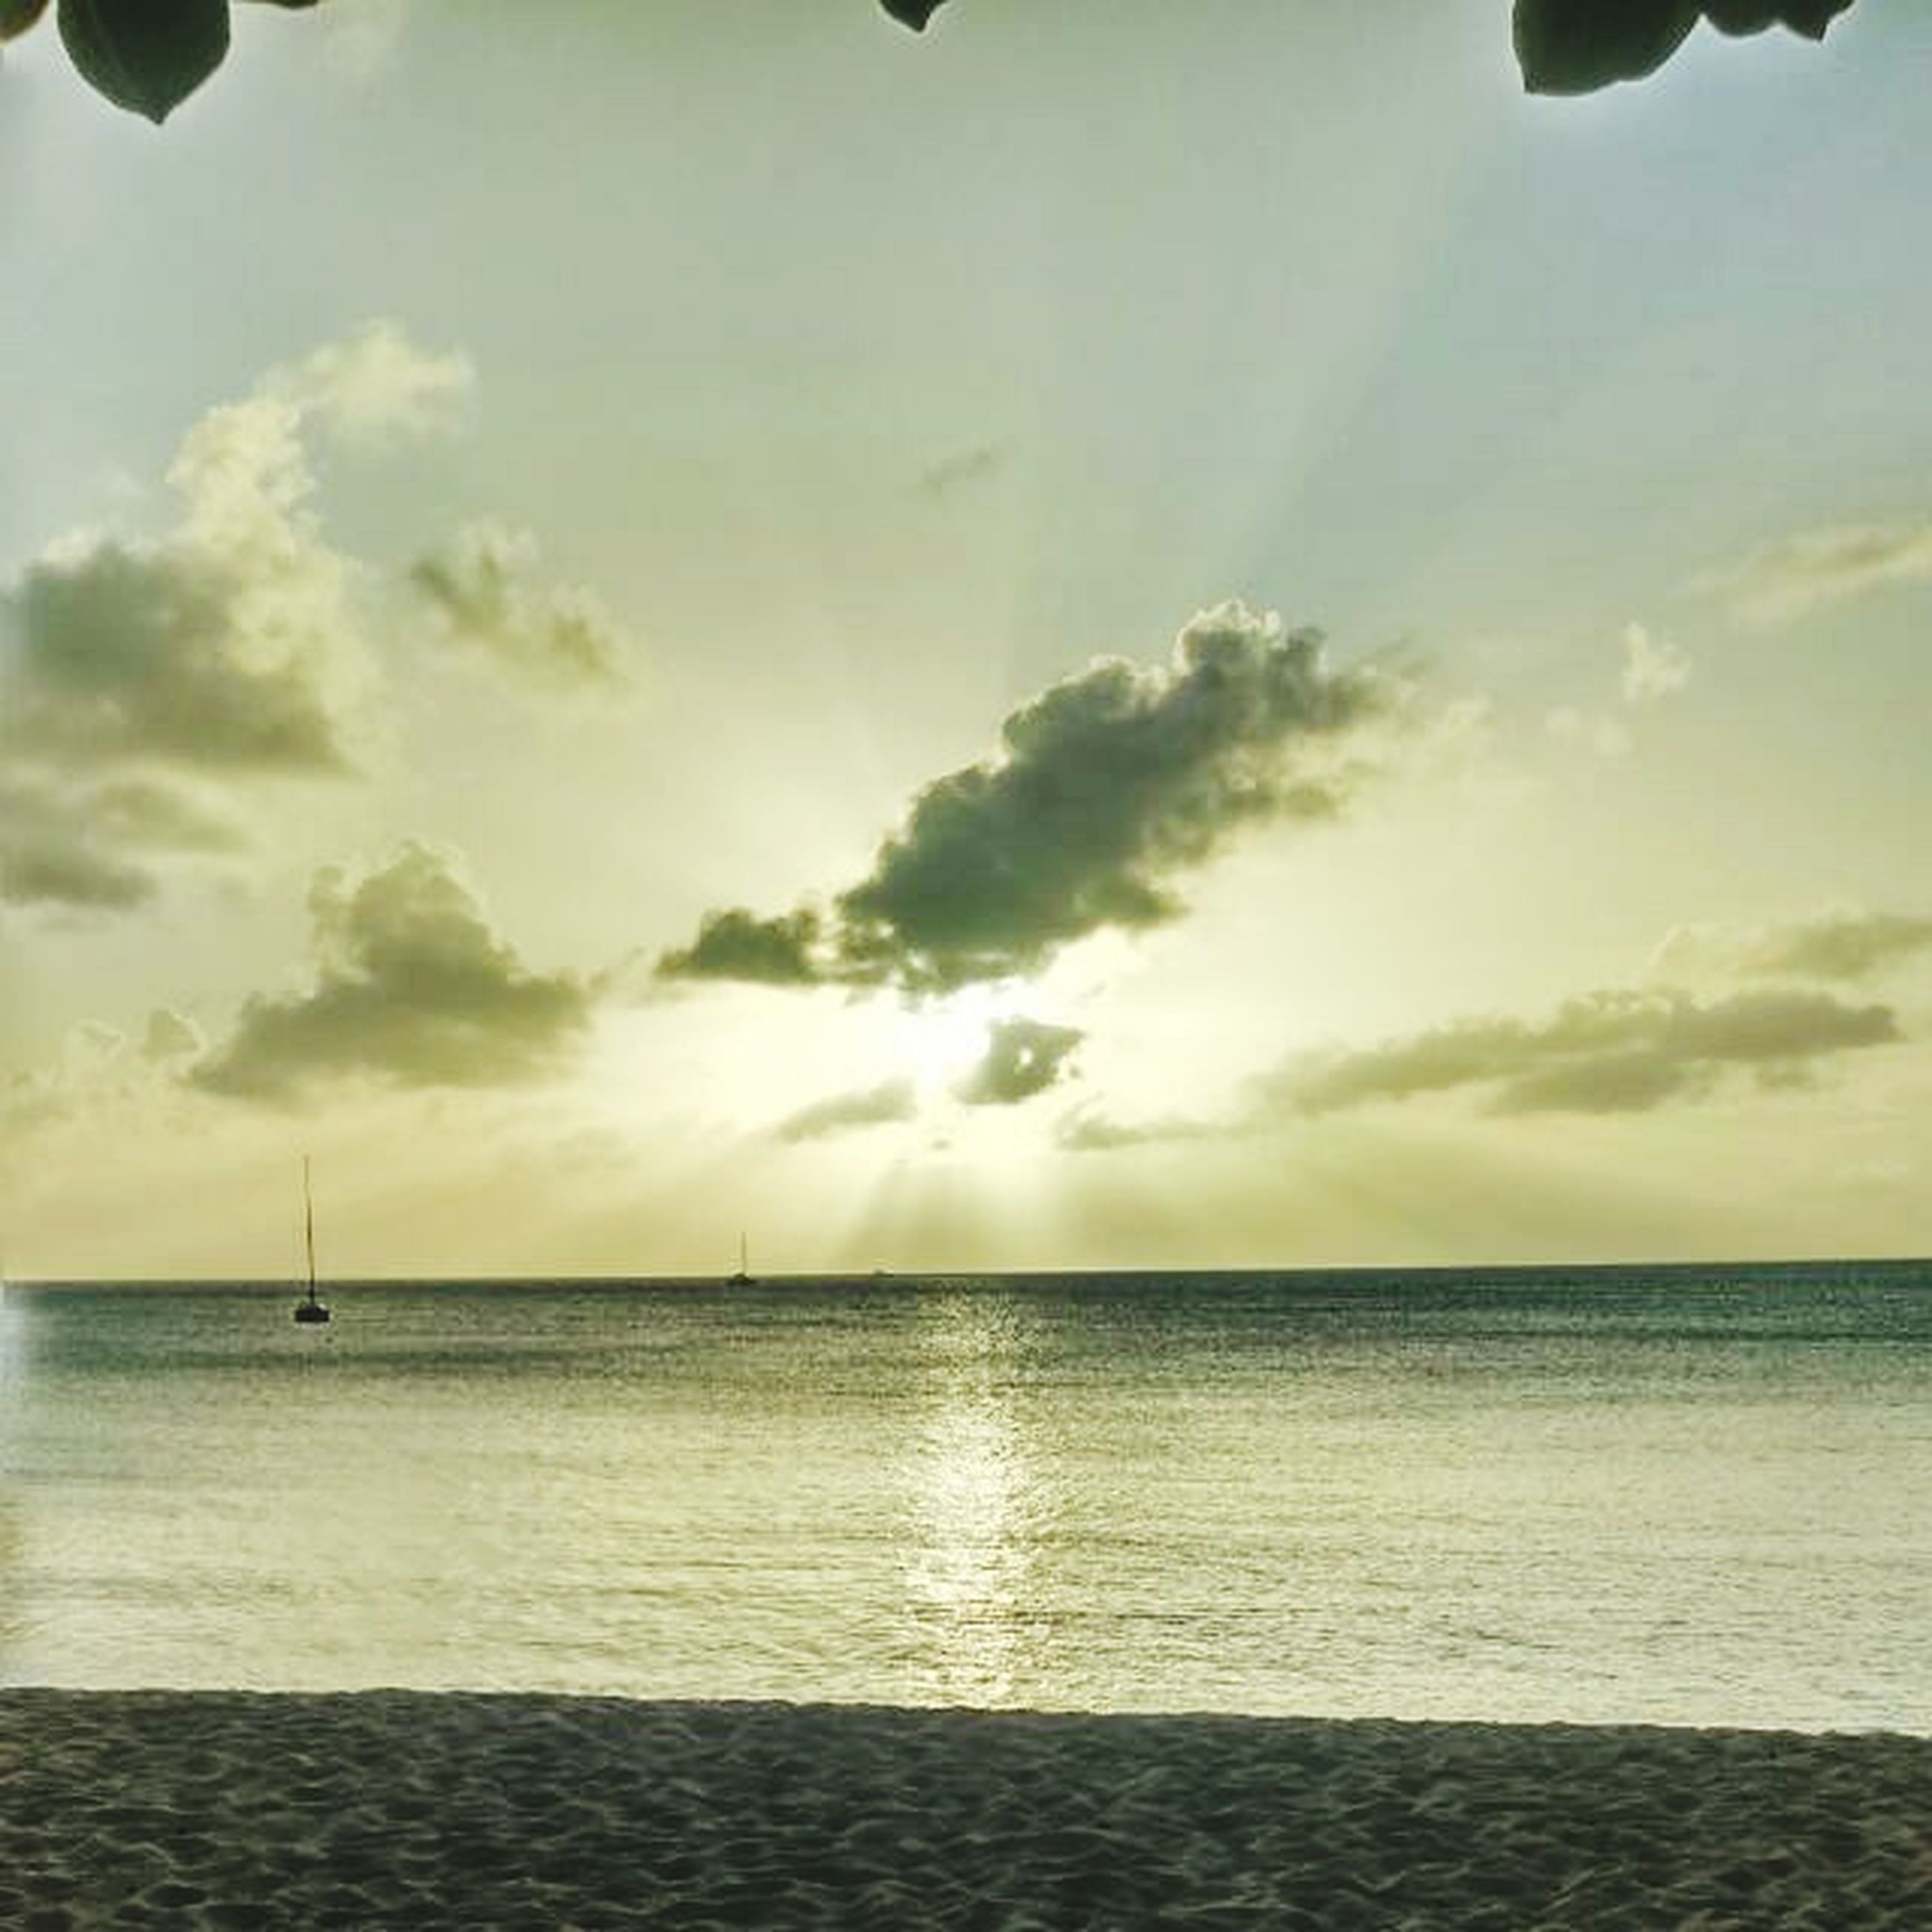 sea, horizon over water, water, sky, scenics, tranquil scene, tranquility, beauty in nature, beach, sunset, cloud - sky, nature, idyllic, shore, sun, nautical vessel, cloud, transportation, sunlight, seascape